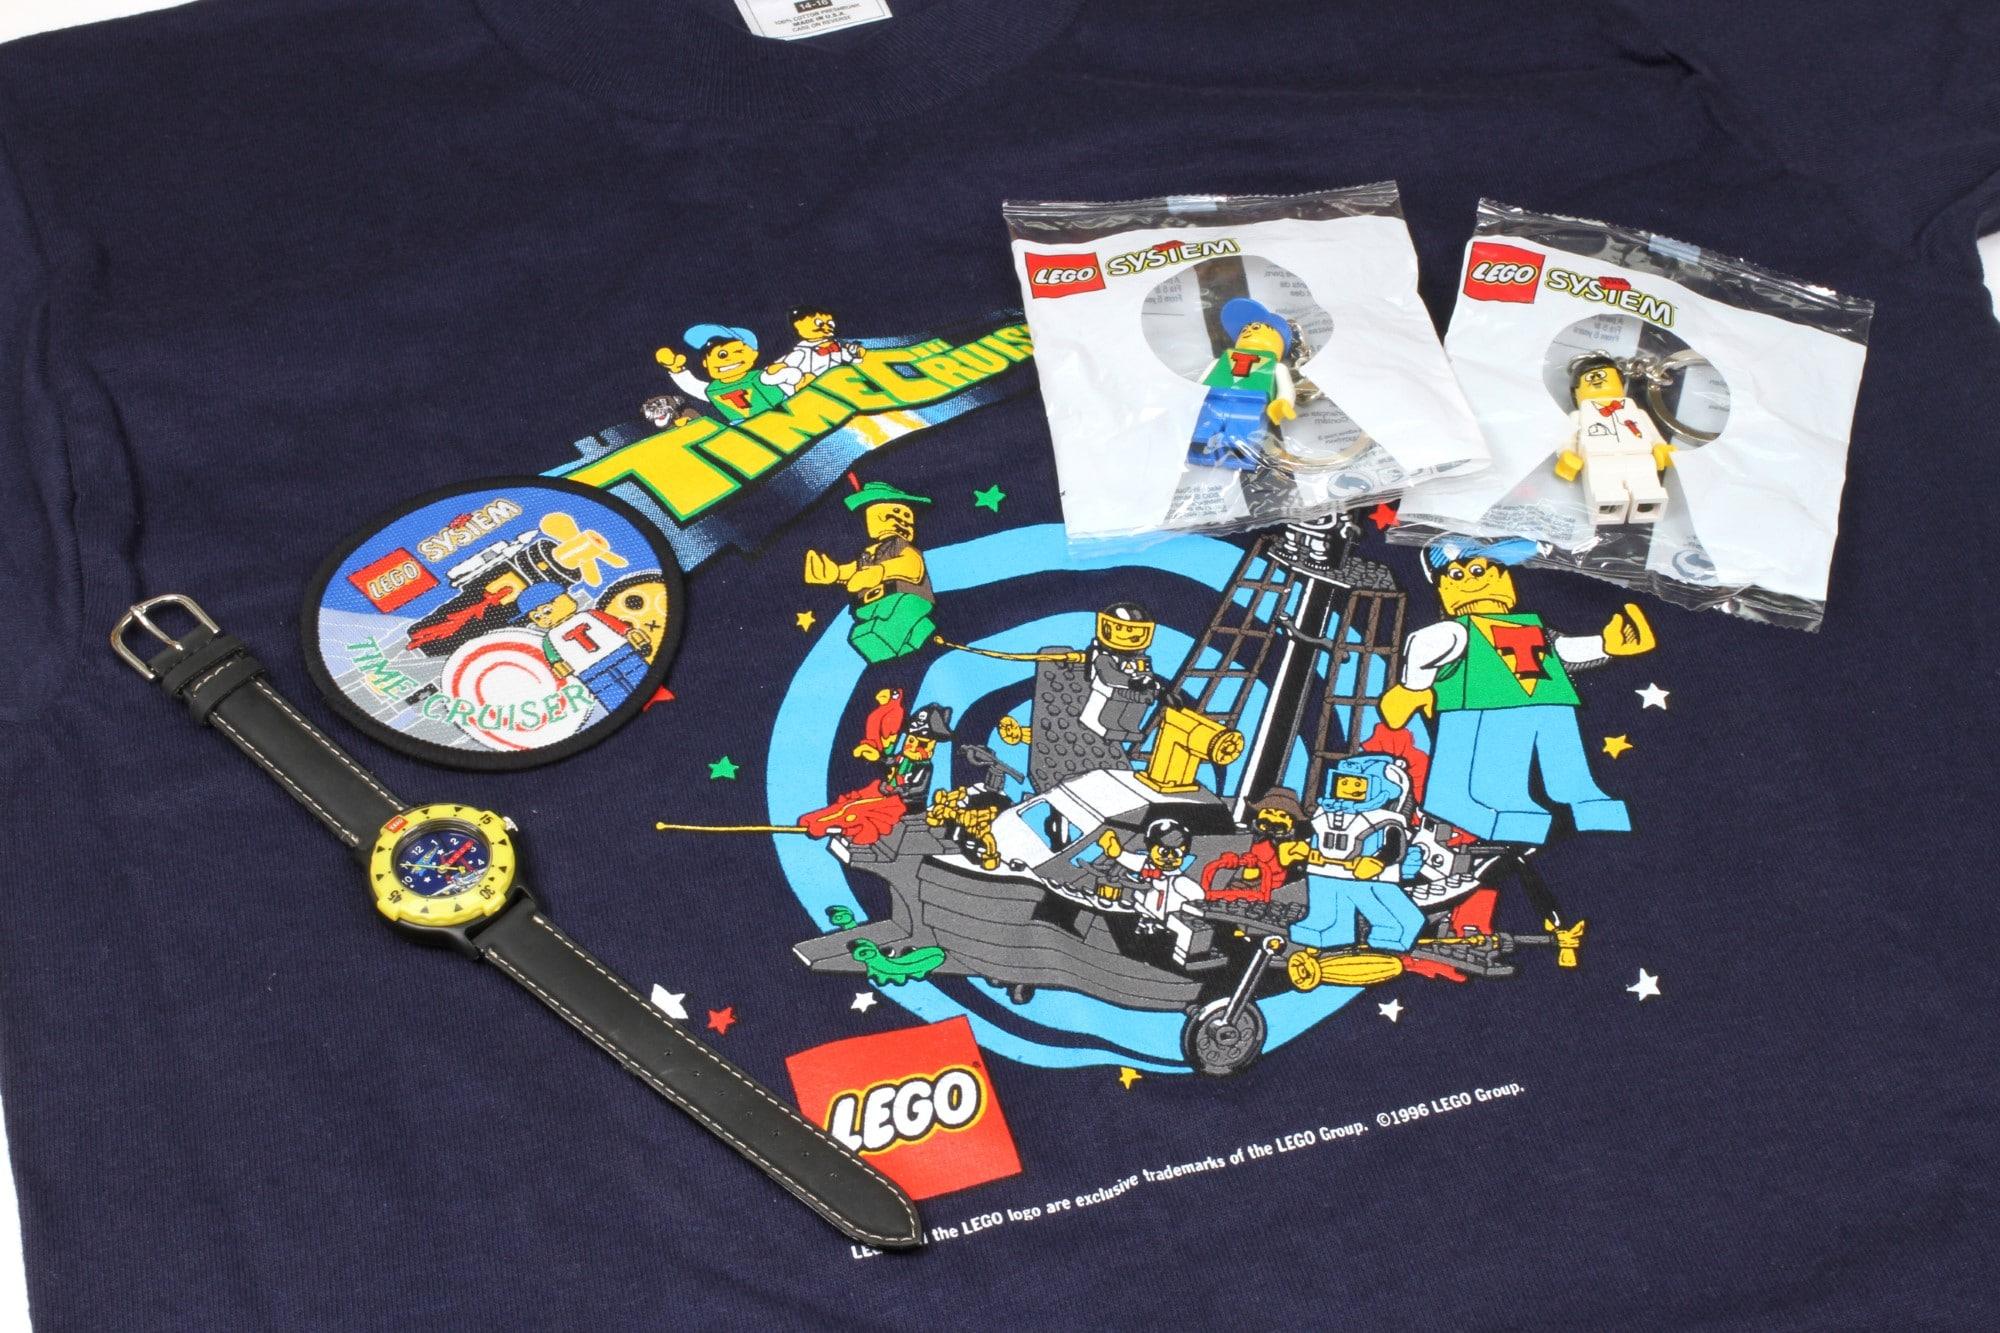 LEGO Time Cruisers Merchandise 2